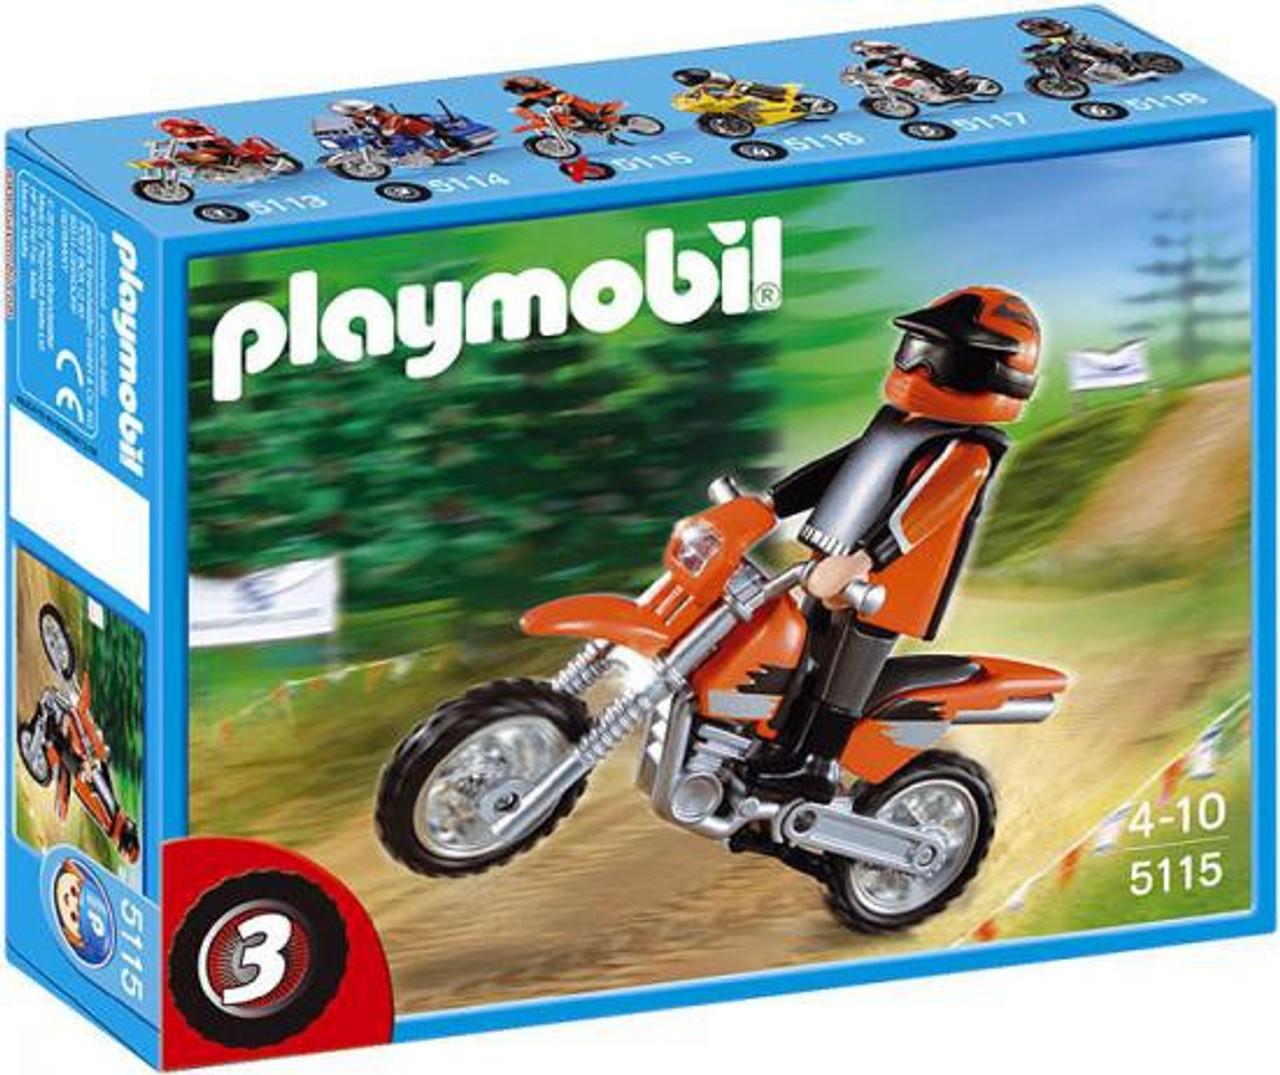 Playmobil Transport Enduro Motorcycle with Rider Set #5115